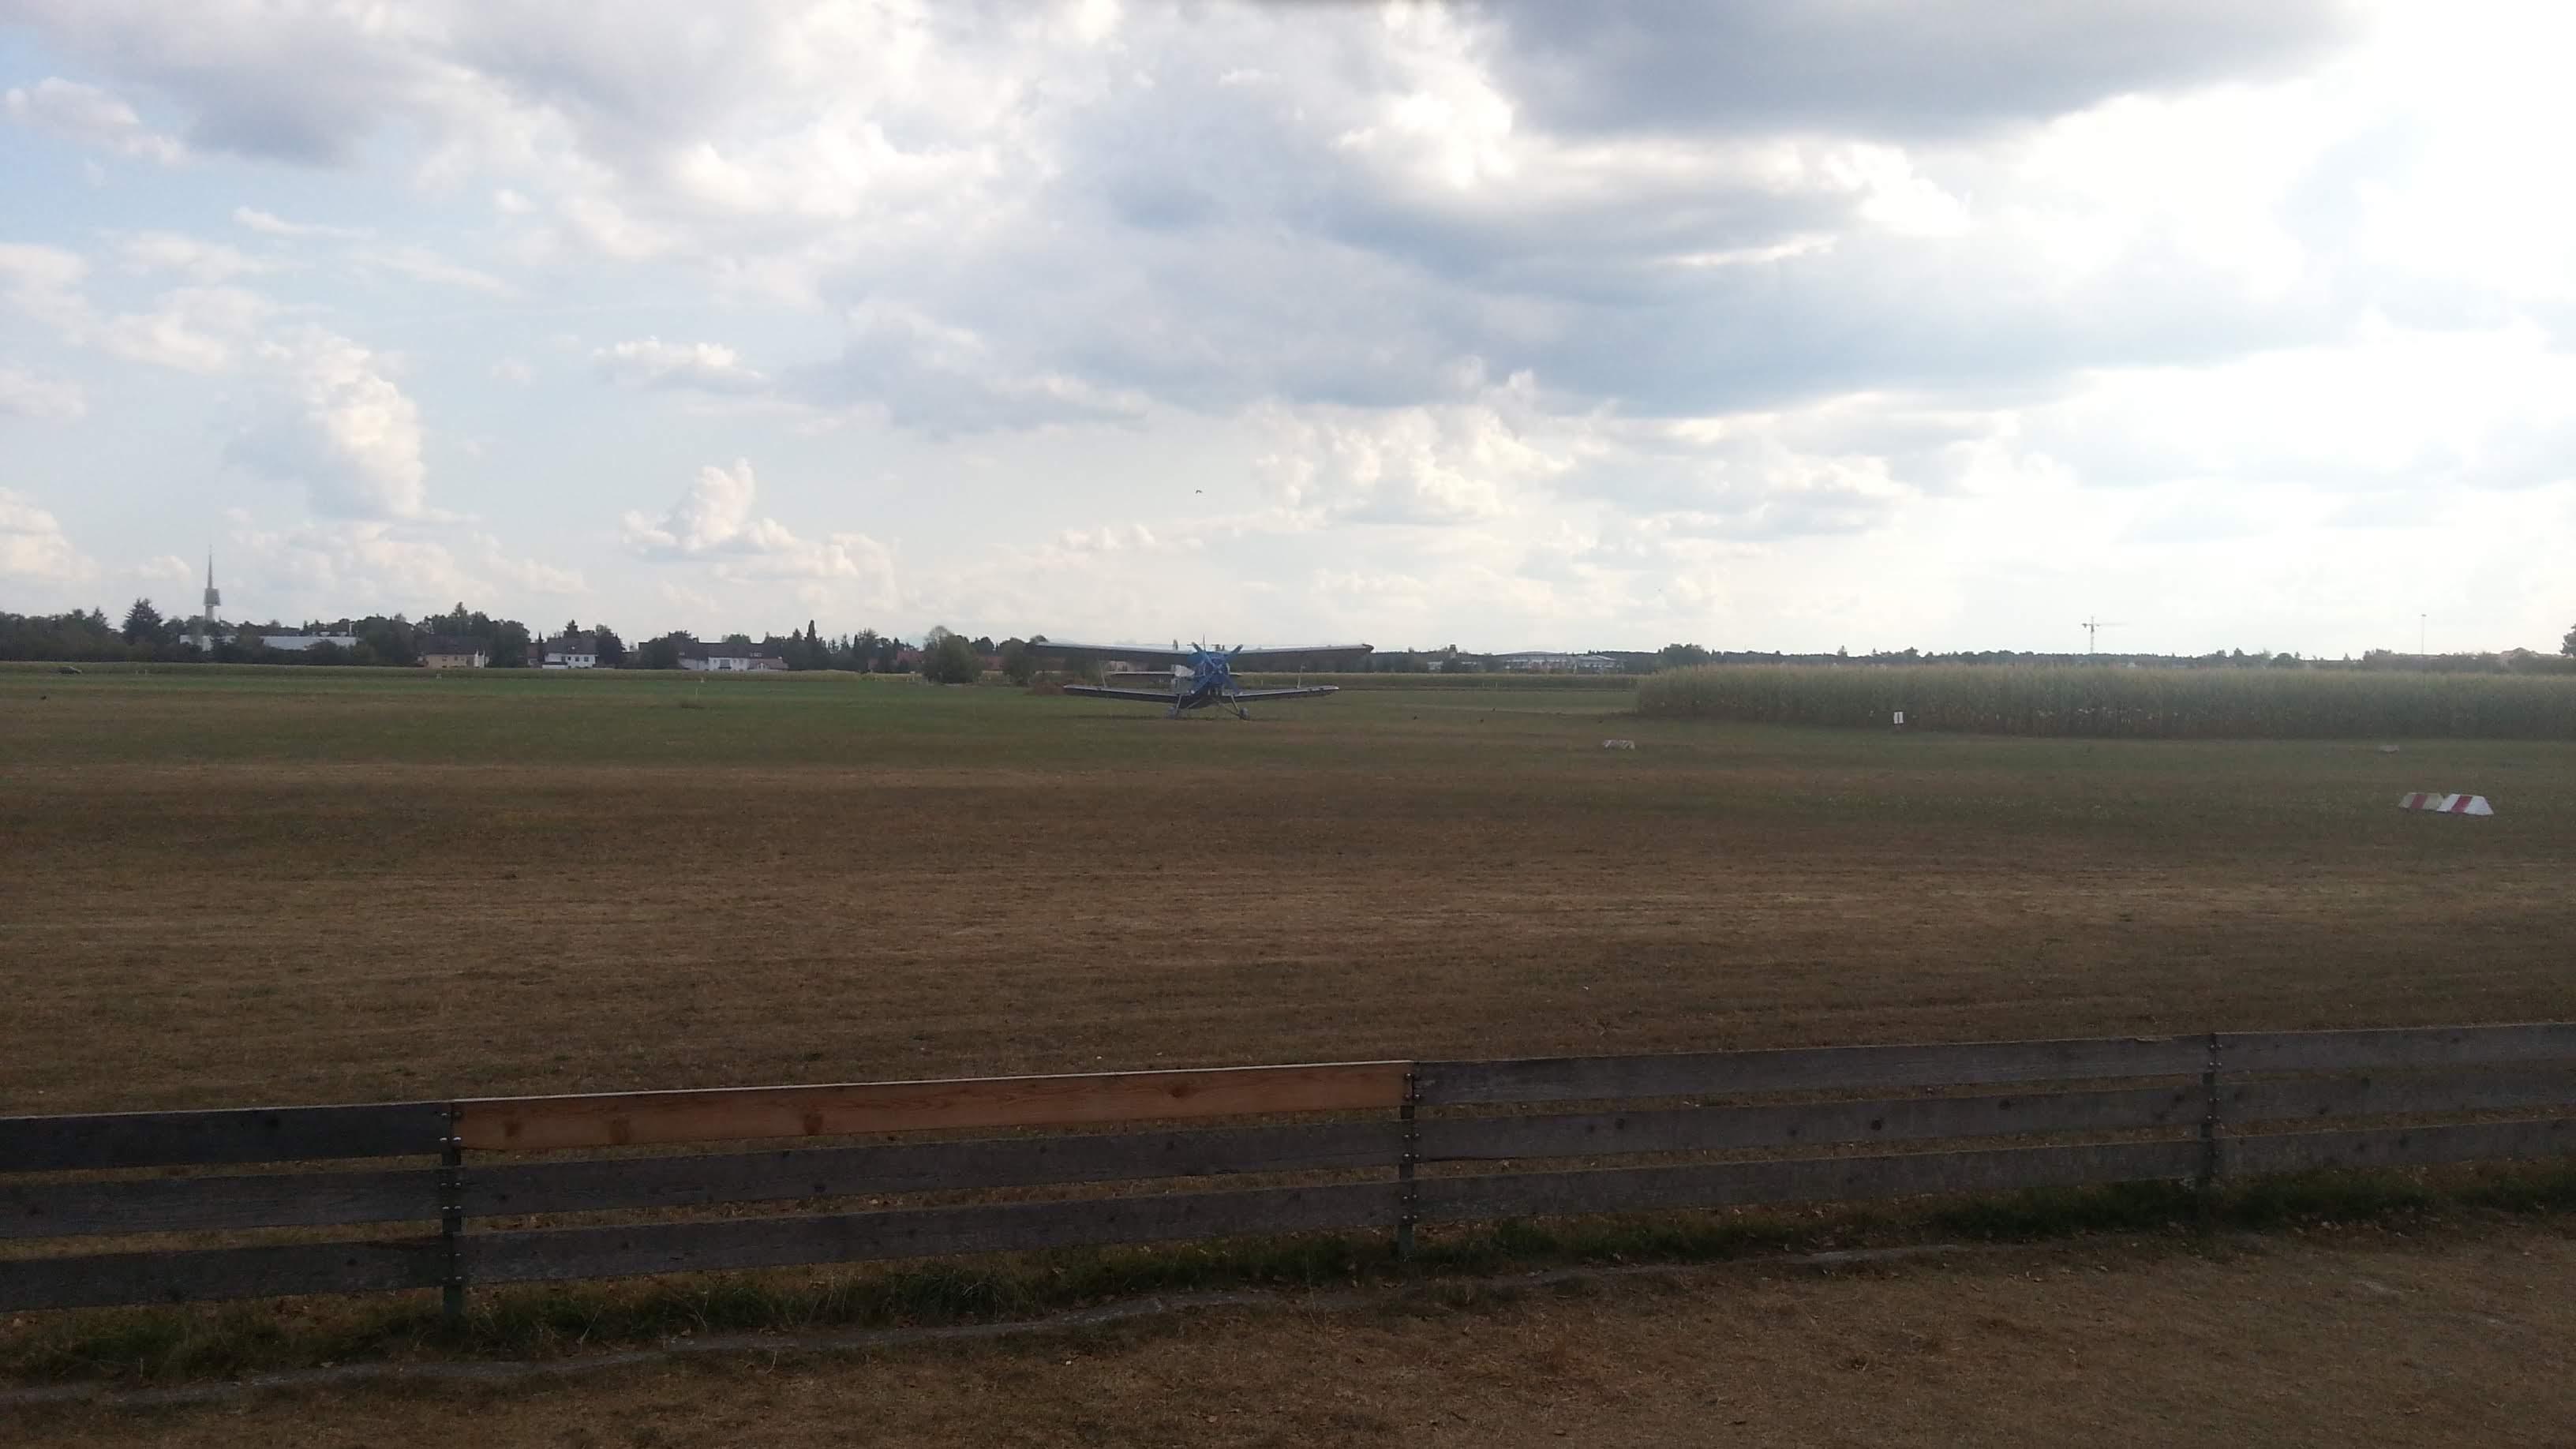 Am Flugplatz kurz vor Bad Wörishofen